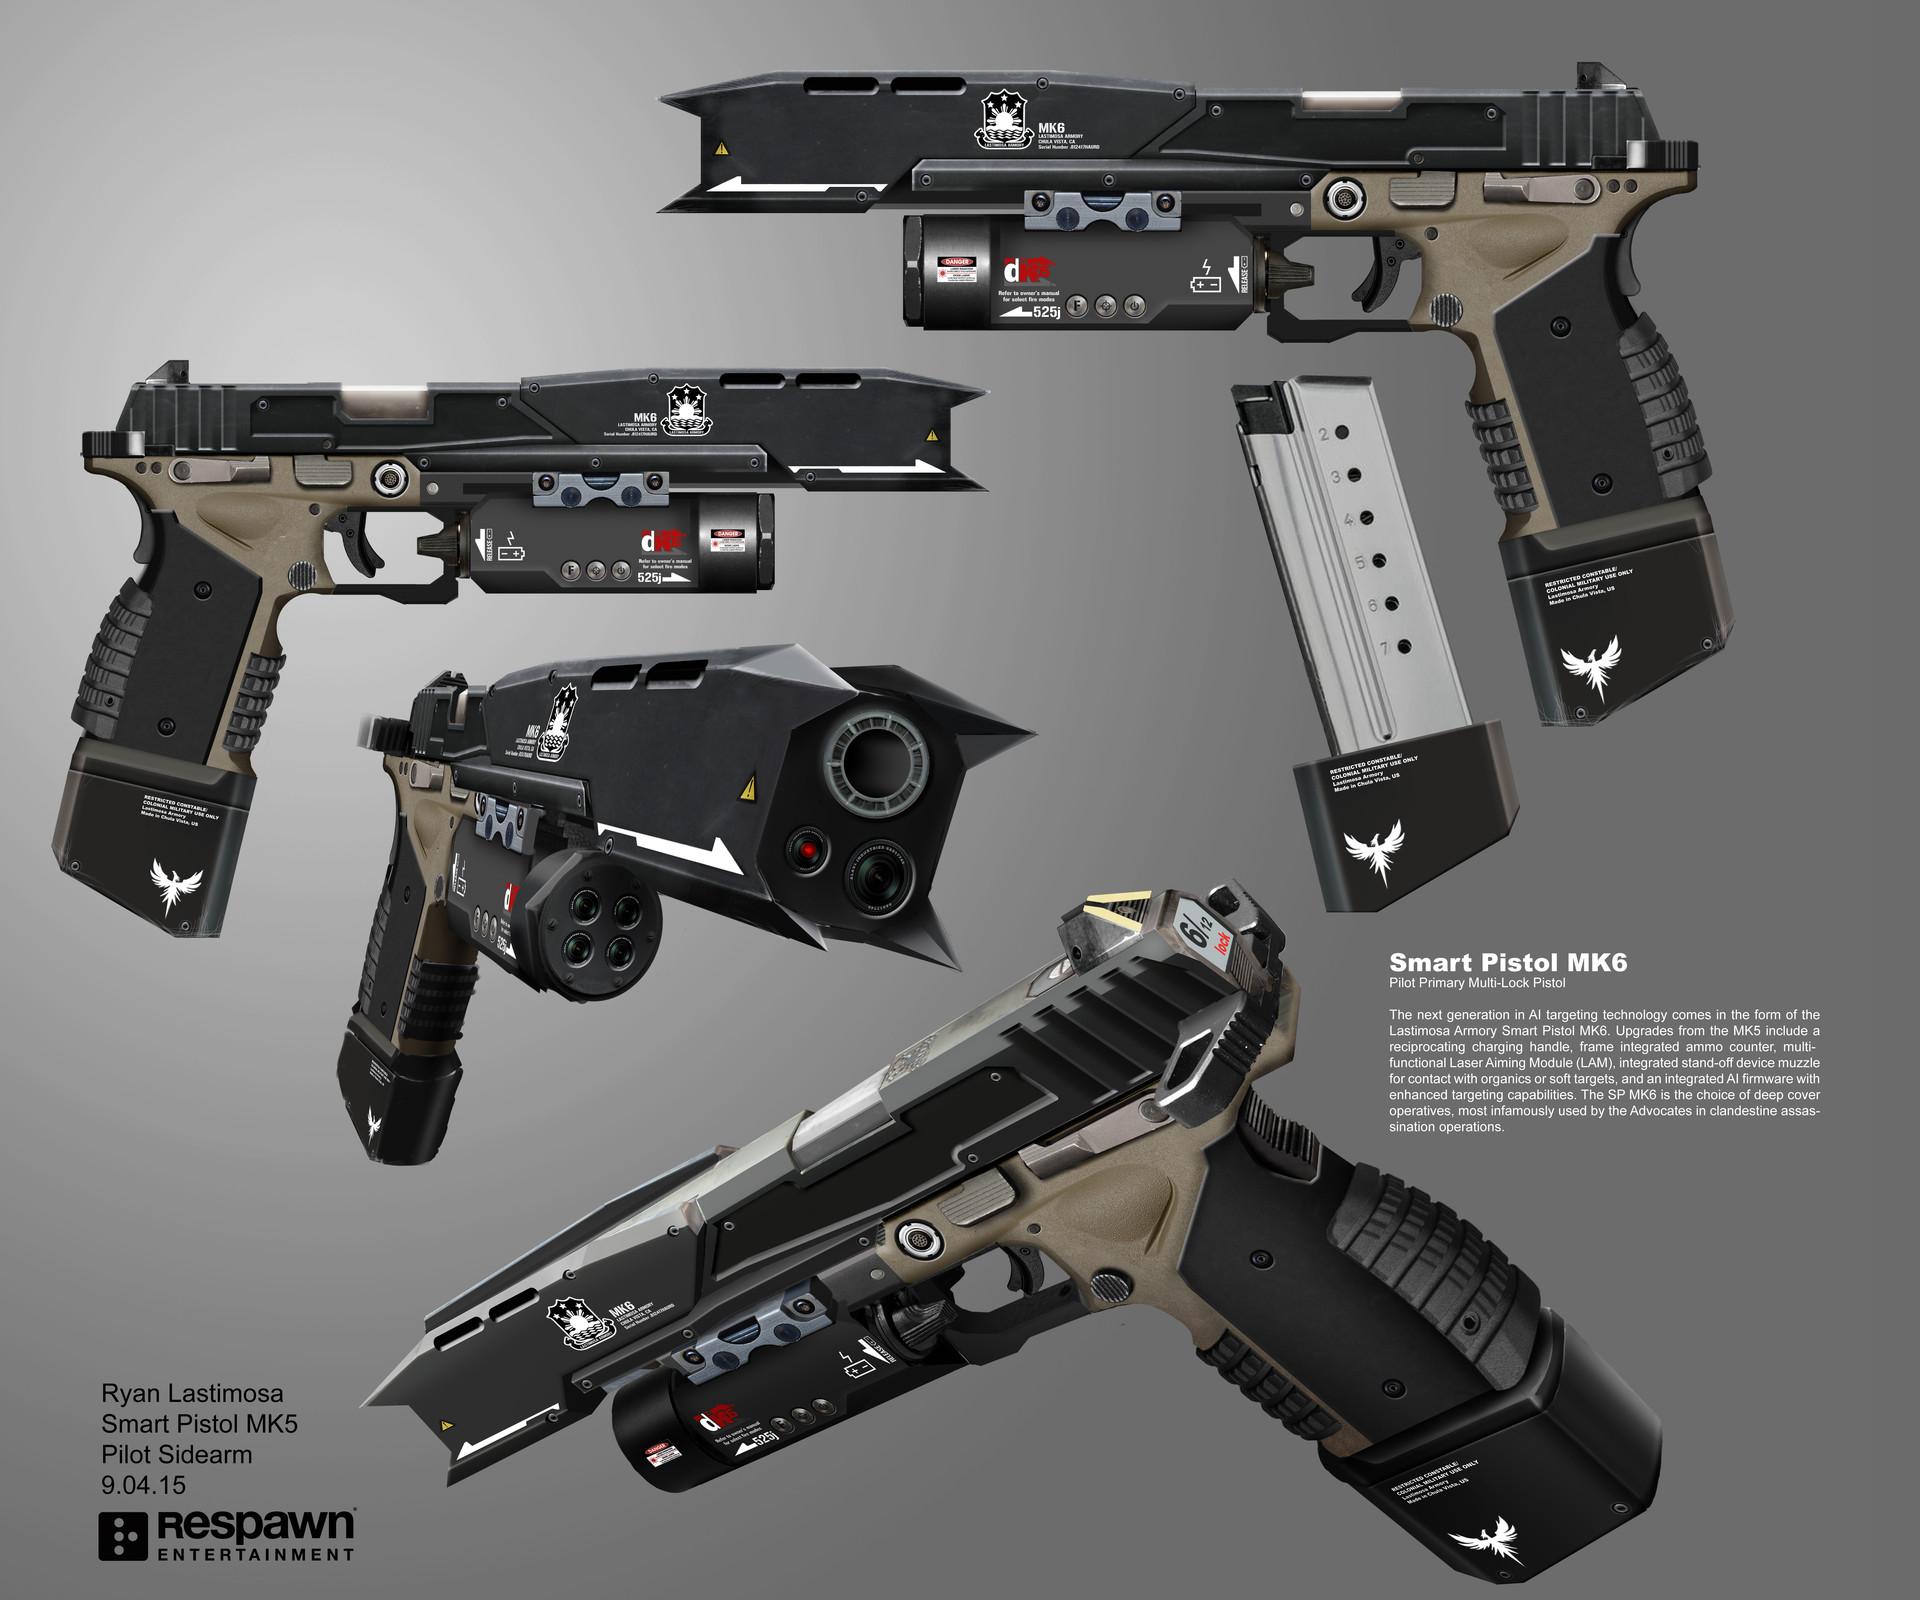 Smart Pistol MK6 | Titanfall Wiki | FANDOM powered by Wikia